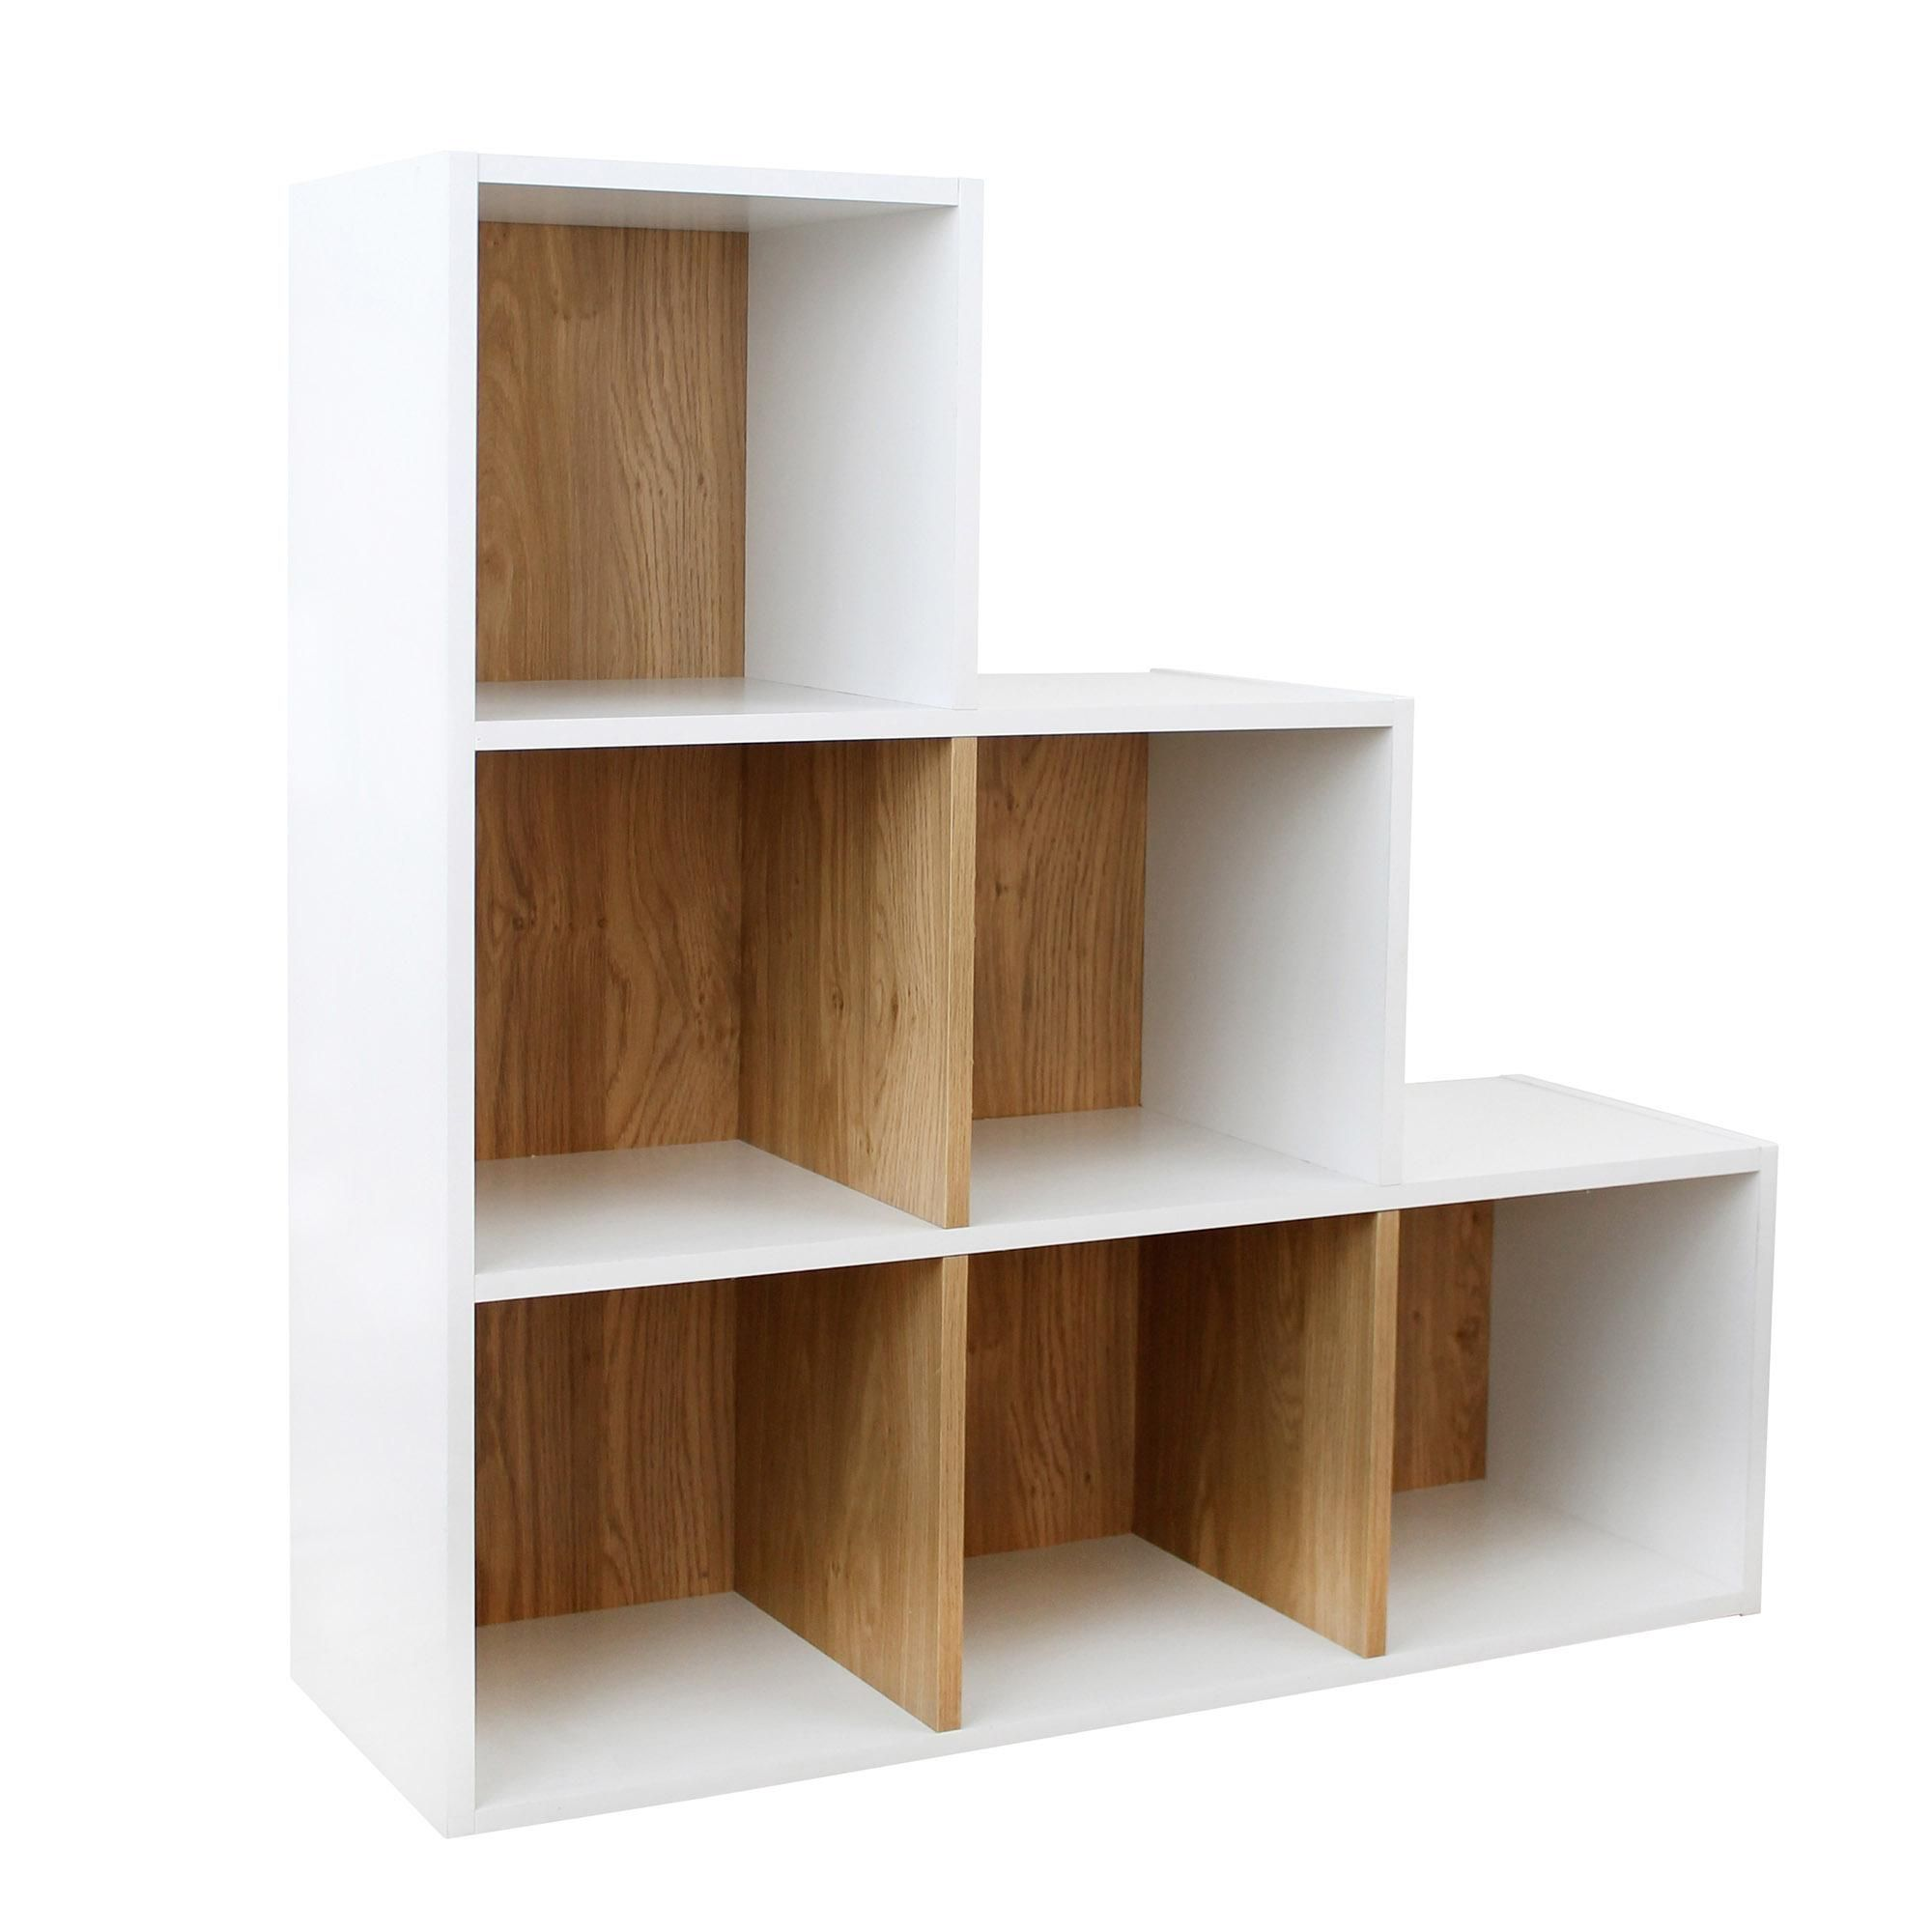 Dunelm Modern White Rome Modular 6 Step Cube Shelving Unit In 2020 Cube Shelving Unit Shelves Cheap Shelving Units